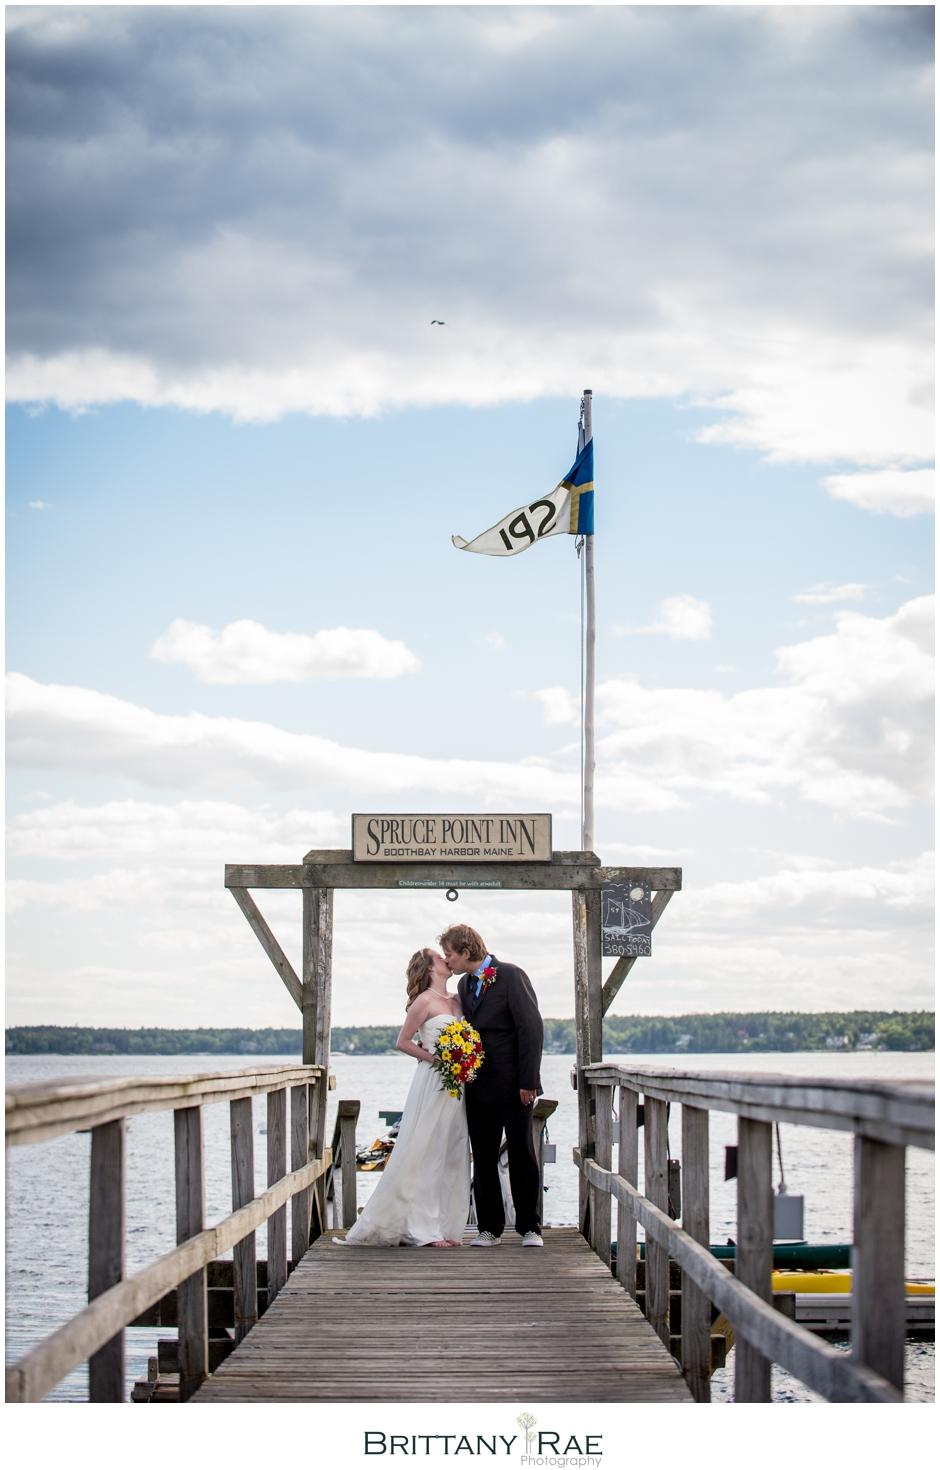 Spruce Point Inn Boothbay Harbor Wedding Photographer Brittany Rae Photography